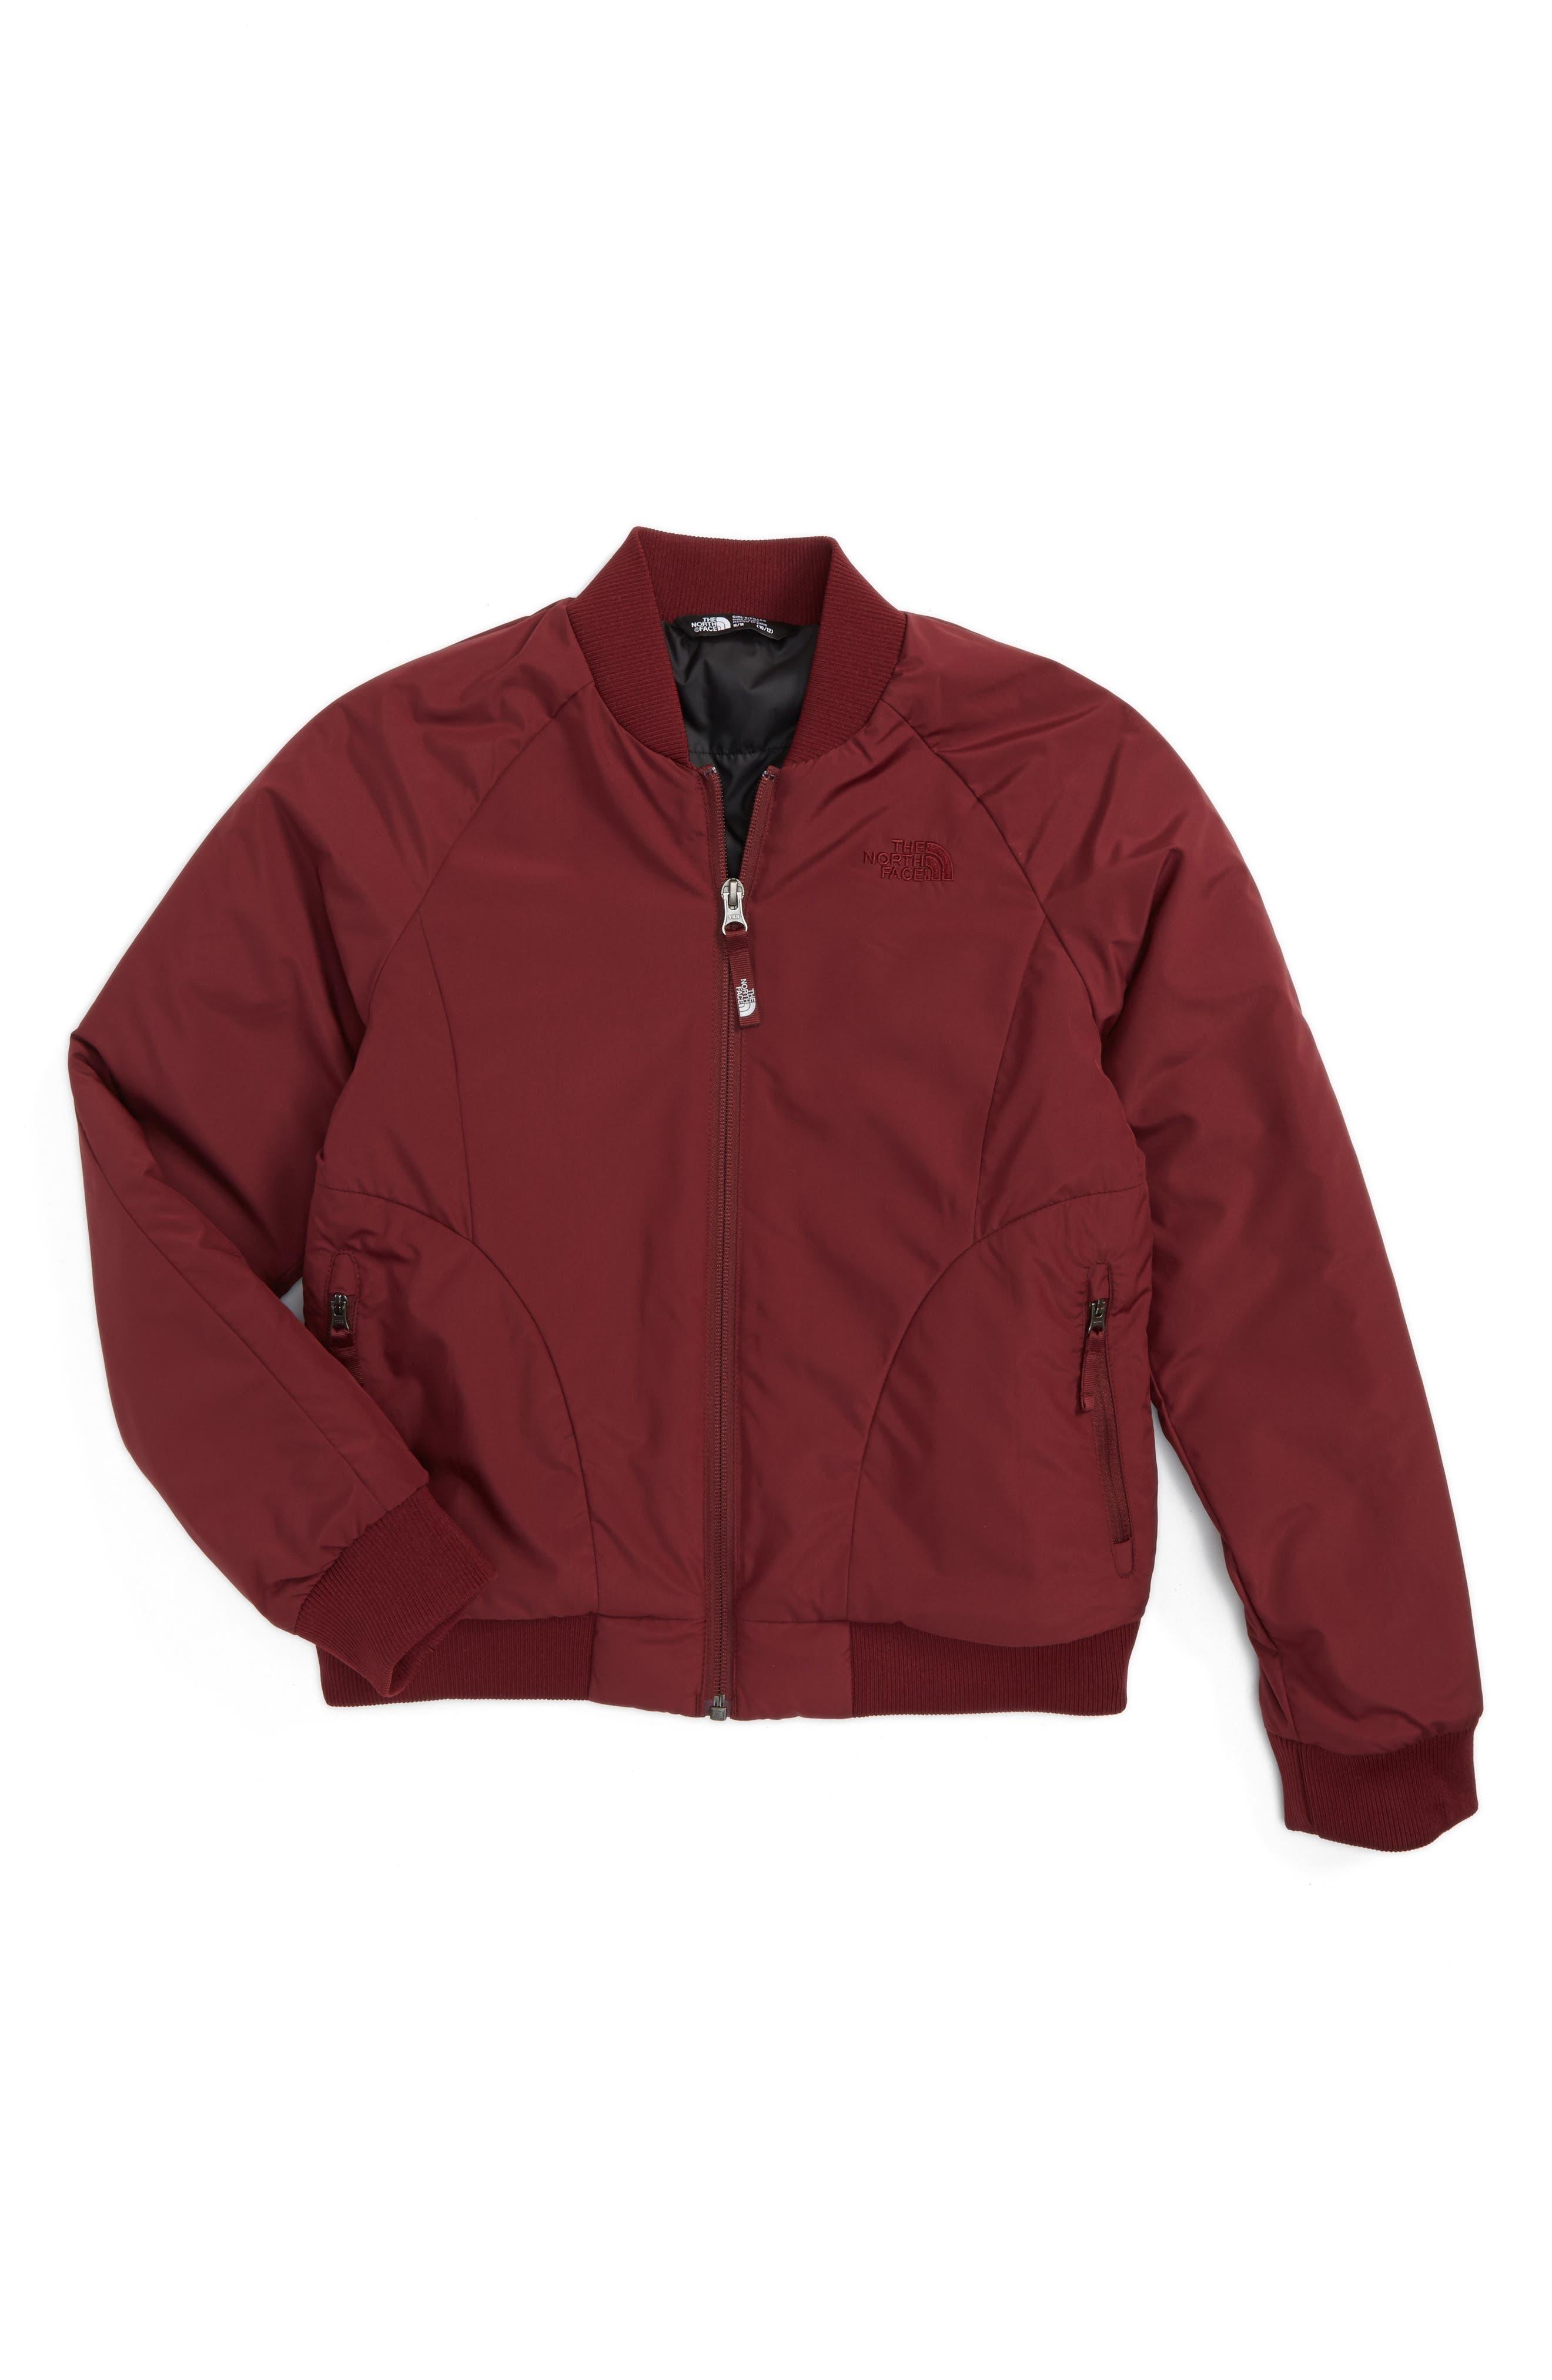 Main Image - The North Face Rydell Heatseeker™ Bomber Jacket (Big Girls)